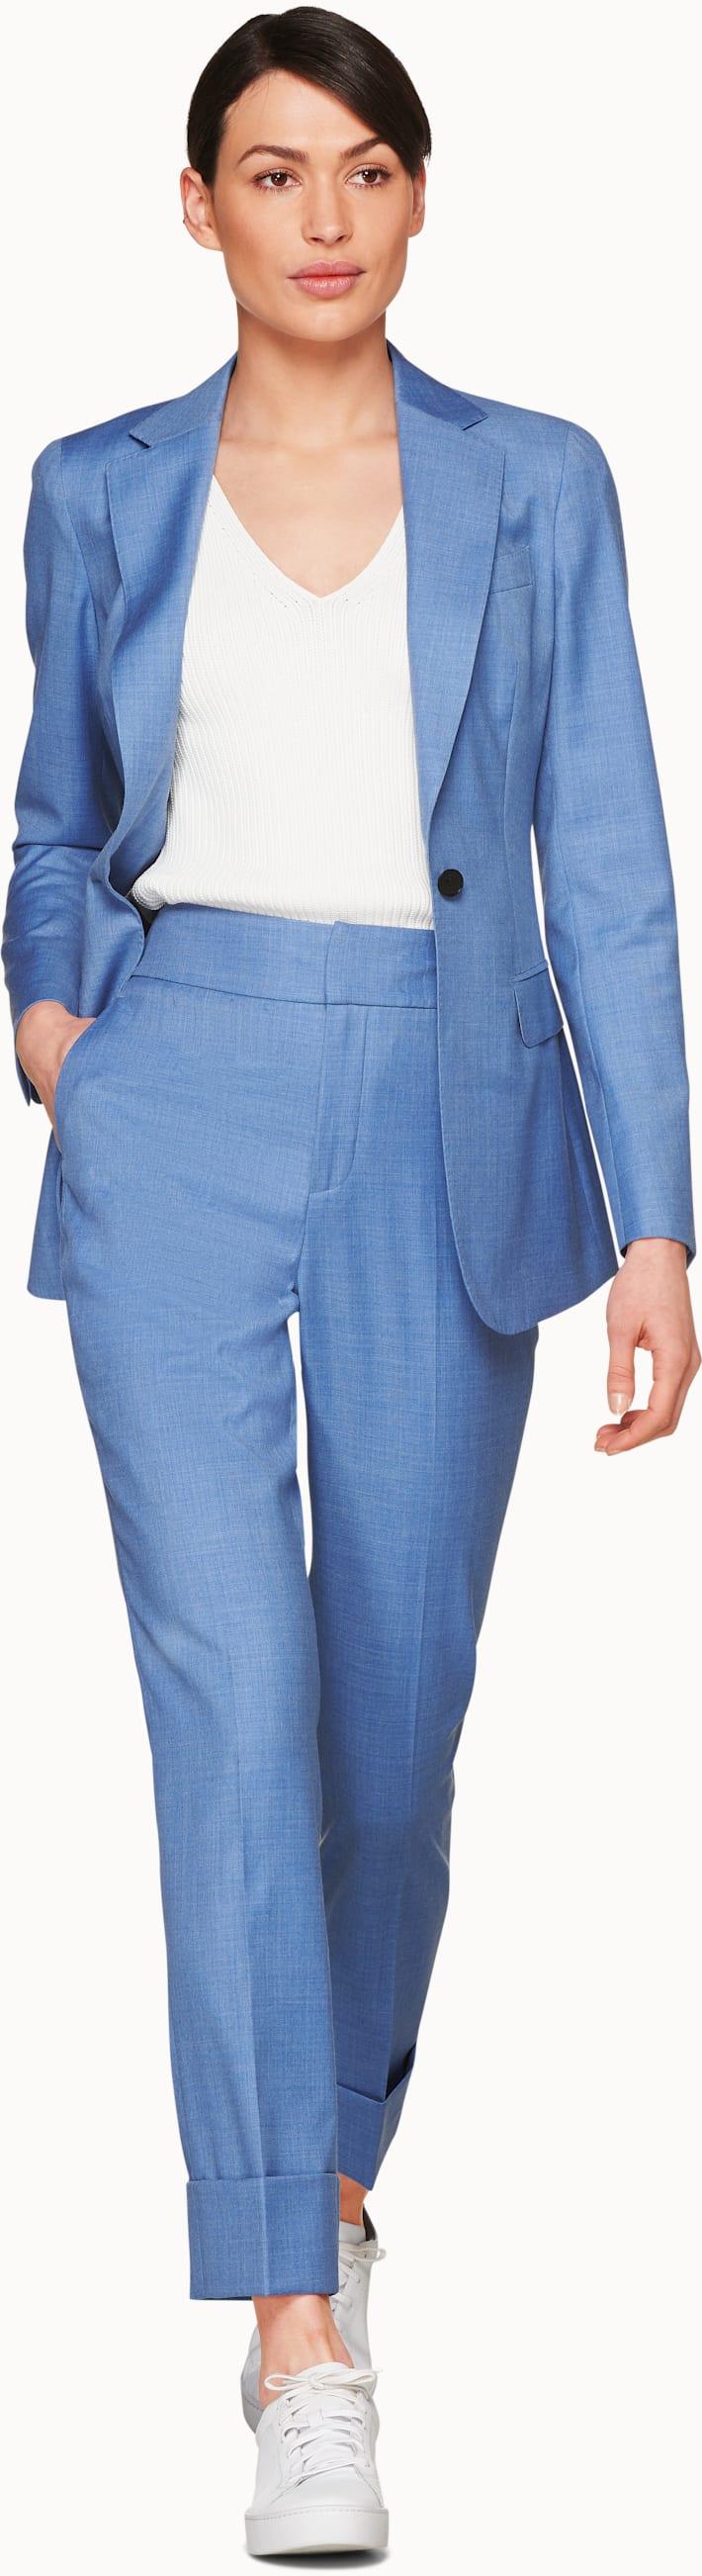 Cameron Light Blue Suit